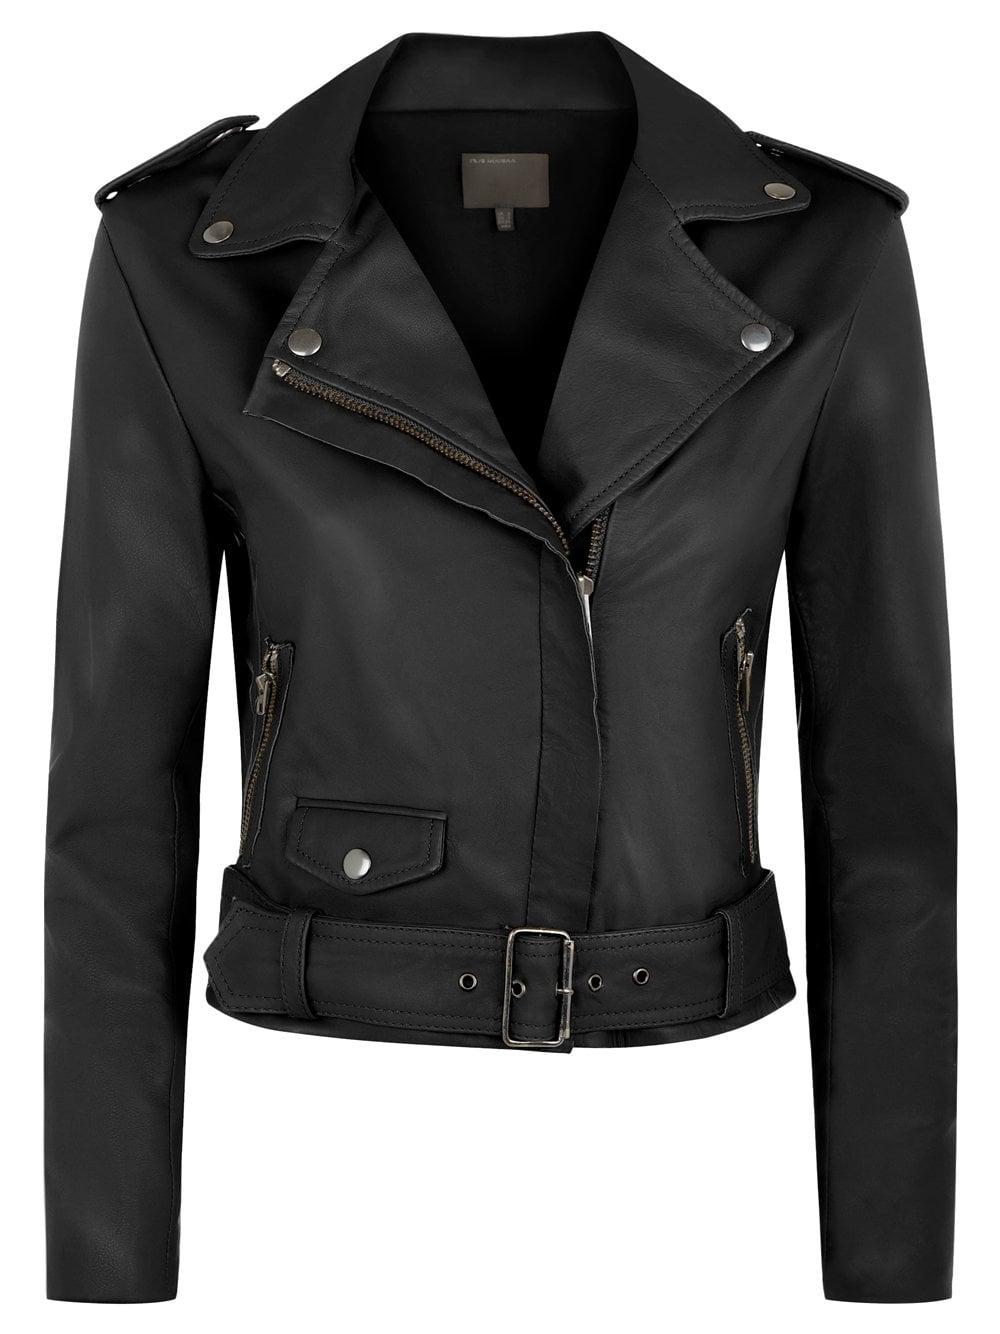 bb3b3c39bfb Reina Black Leather Biker Jacket